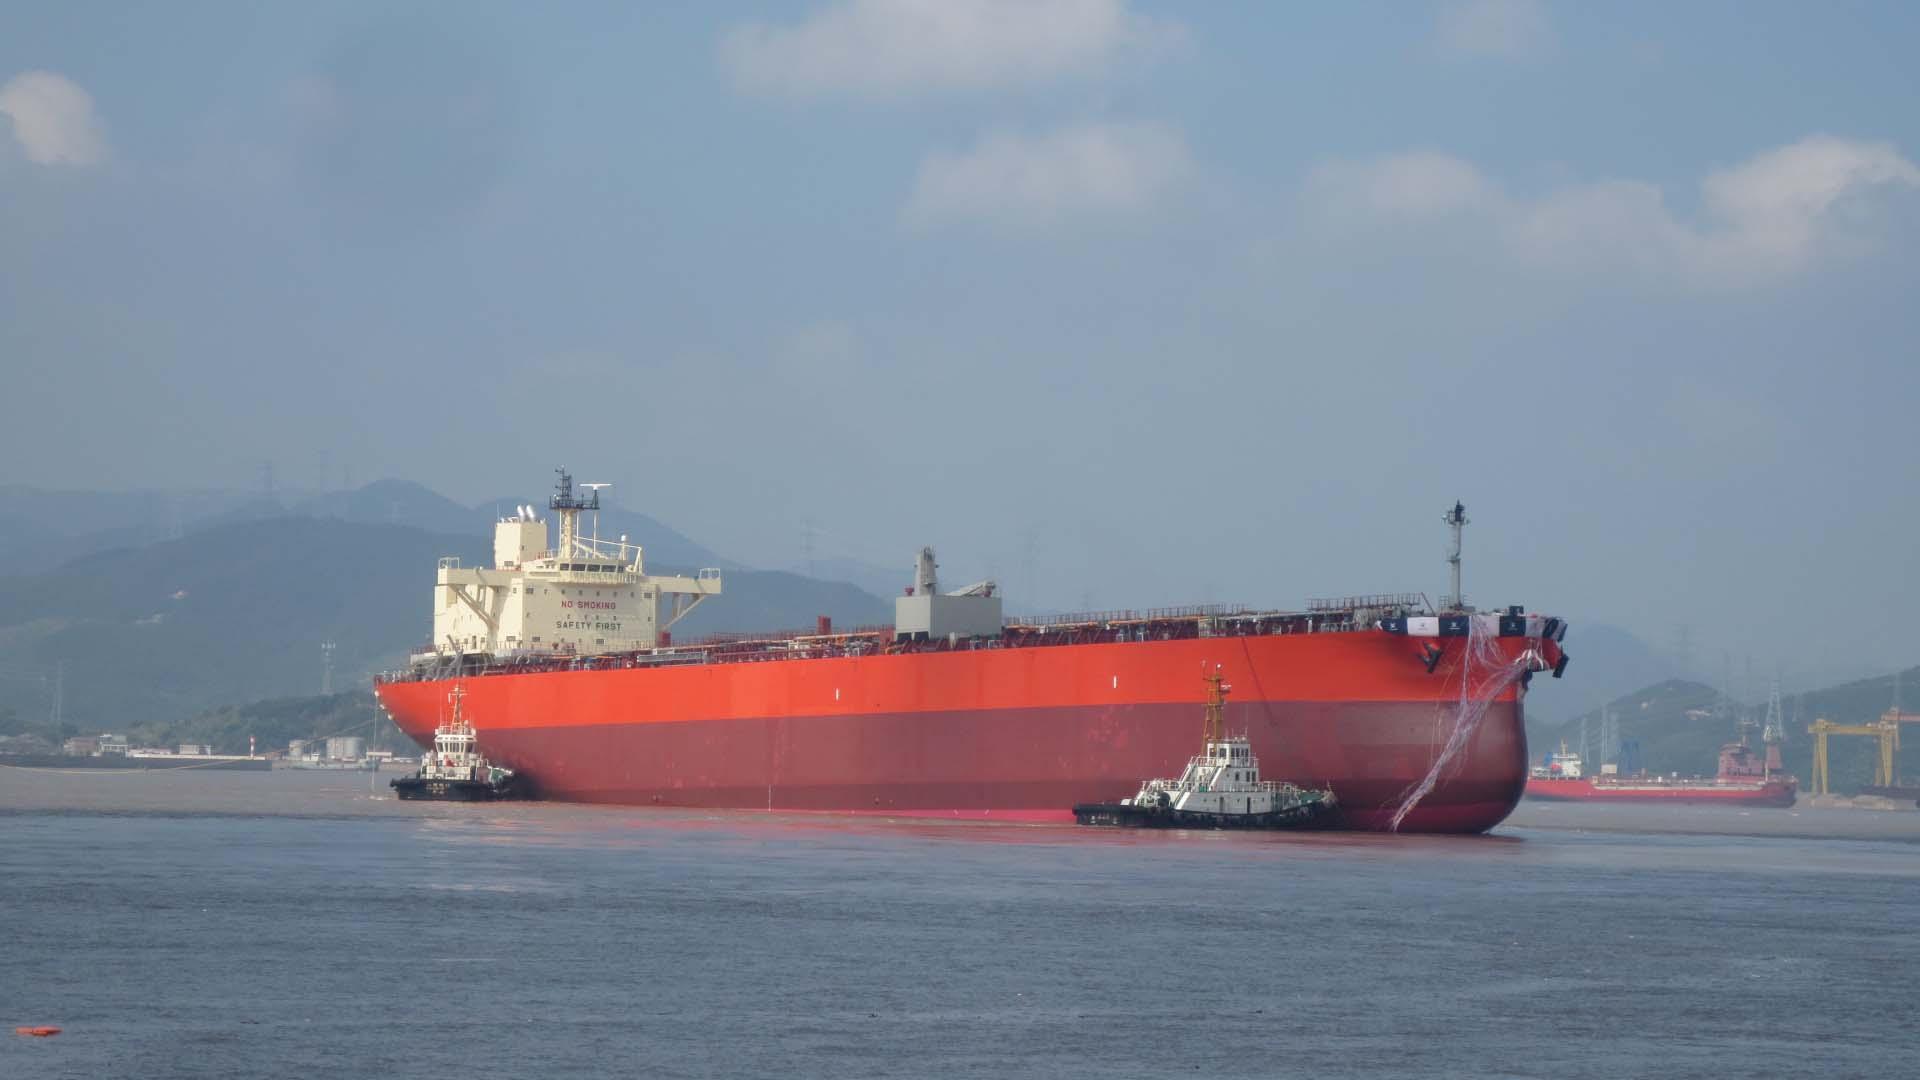 77,000 DWT型(LRI型)成品油轮下水